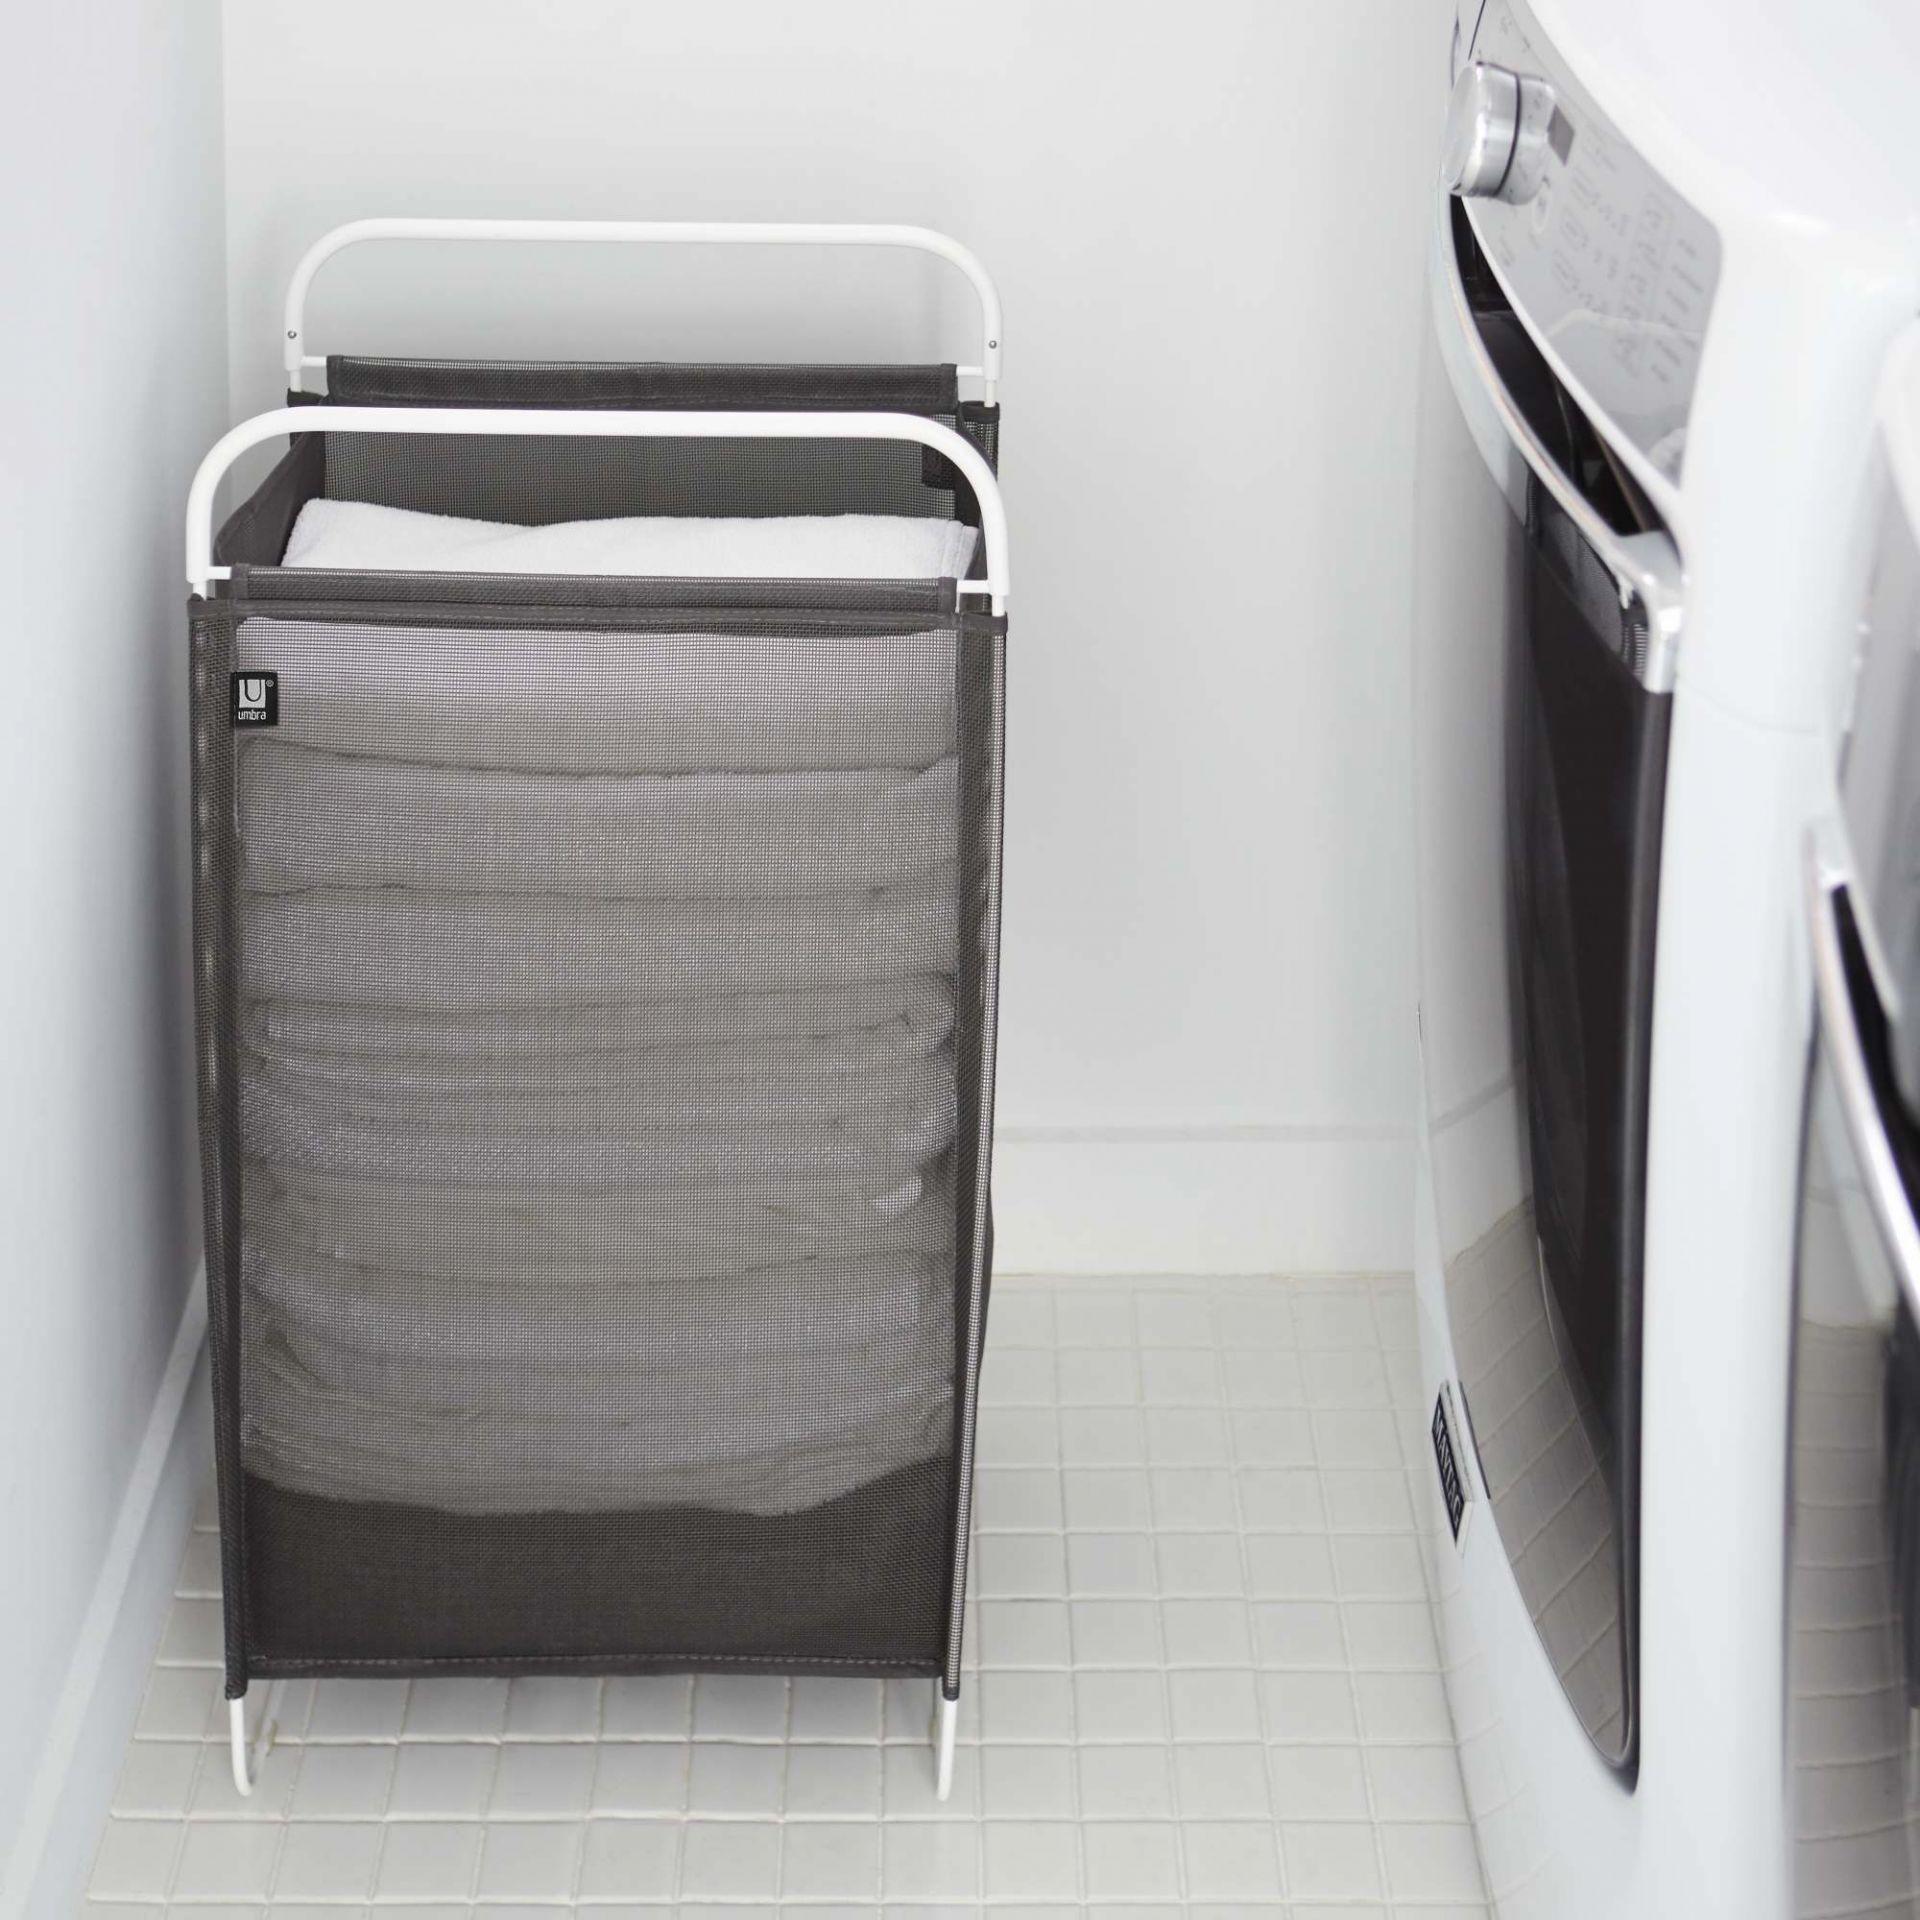 Cinch Laundry Hamper Wäschekorb Umbra